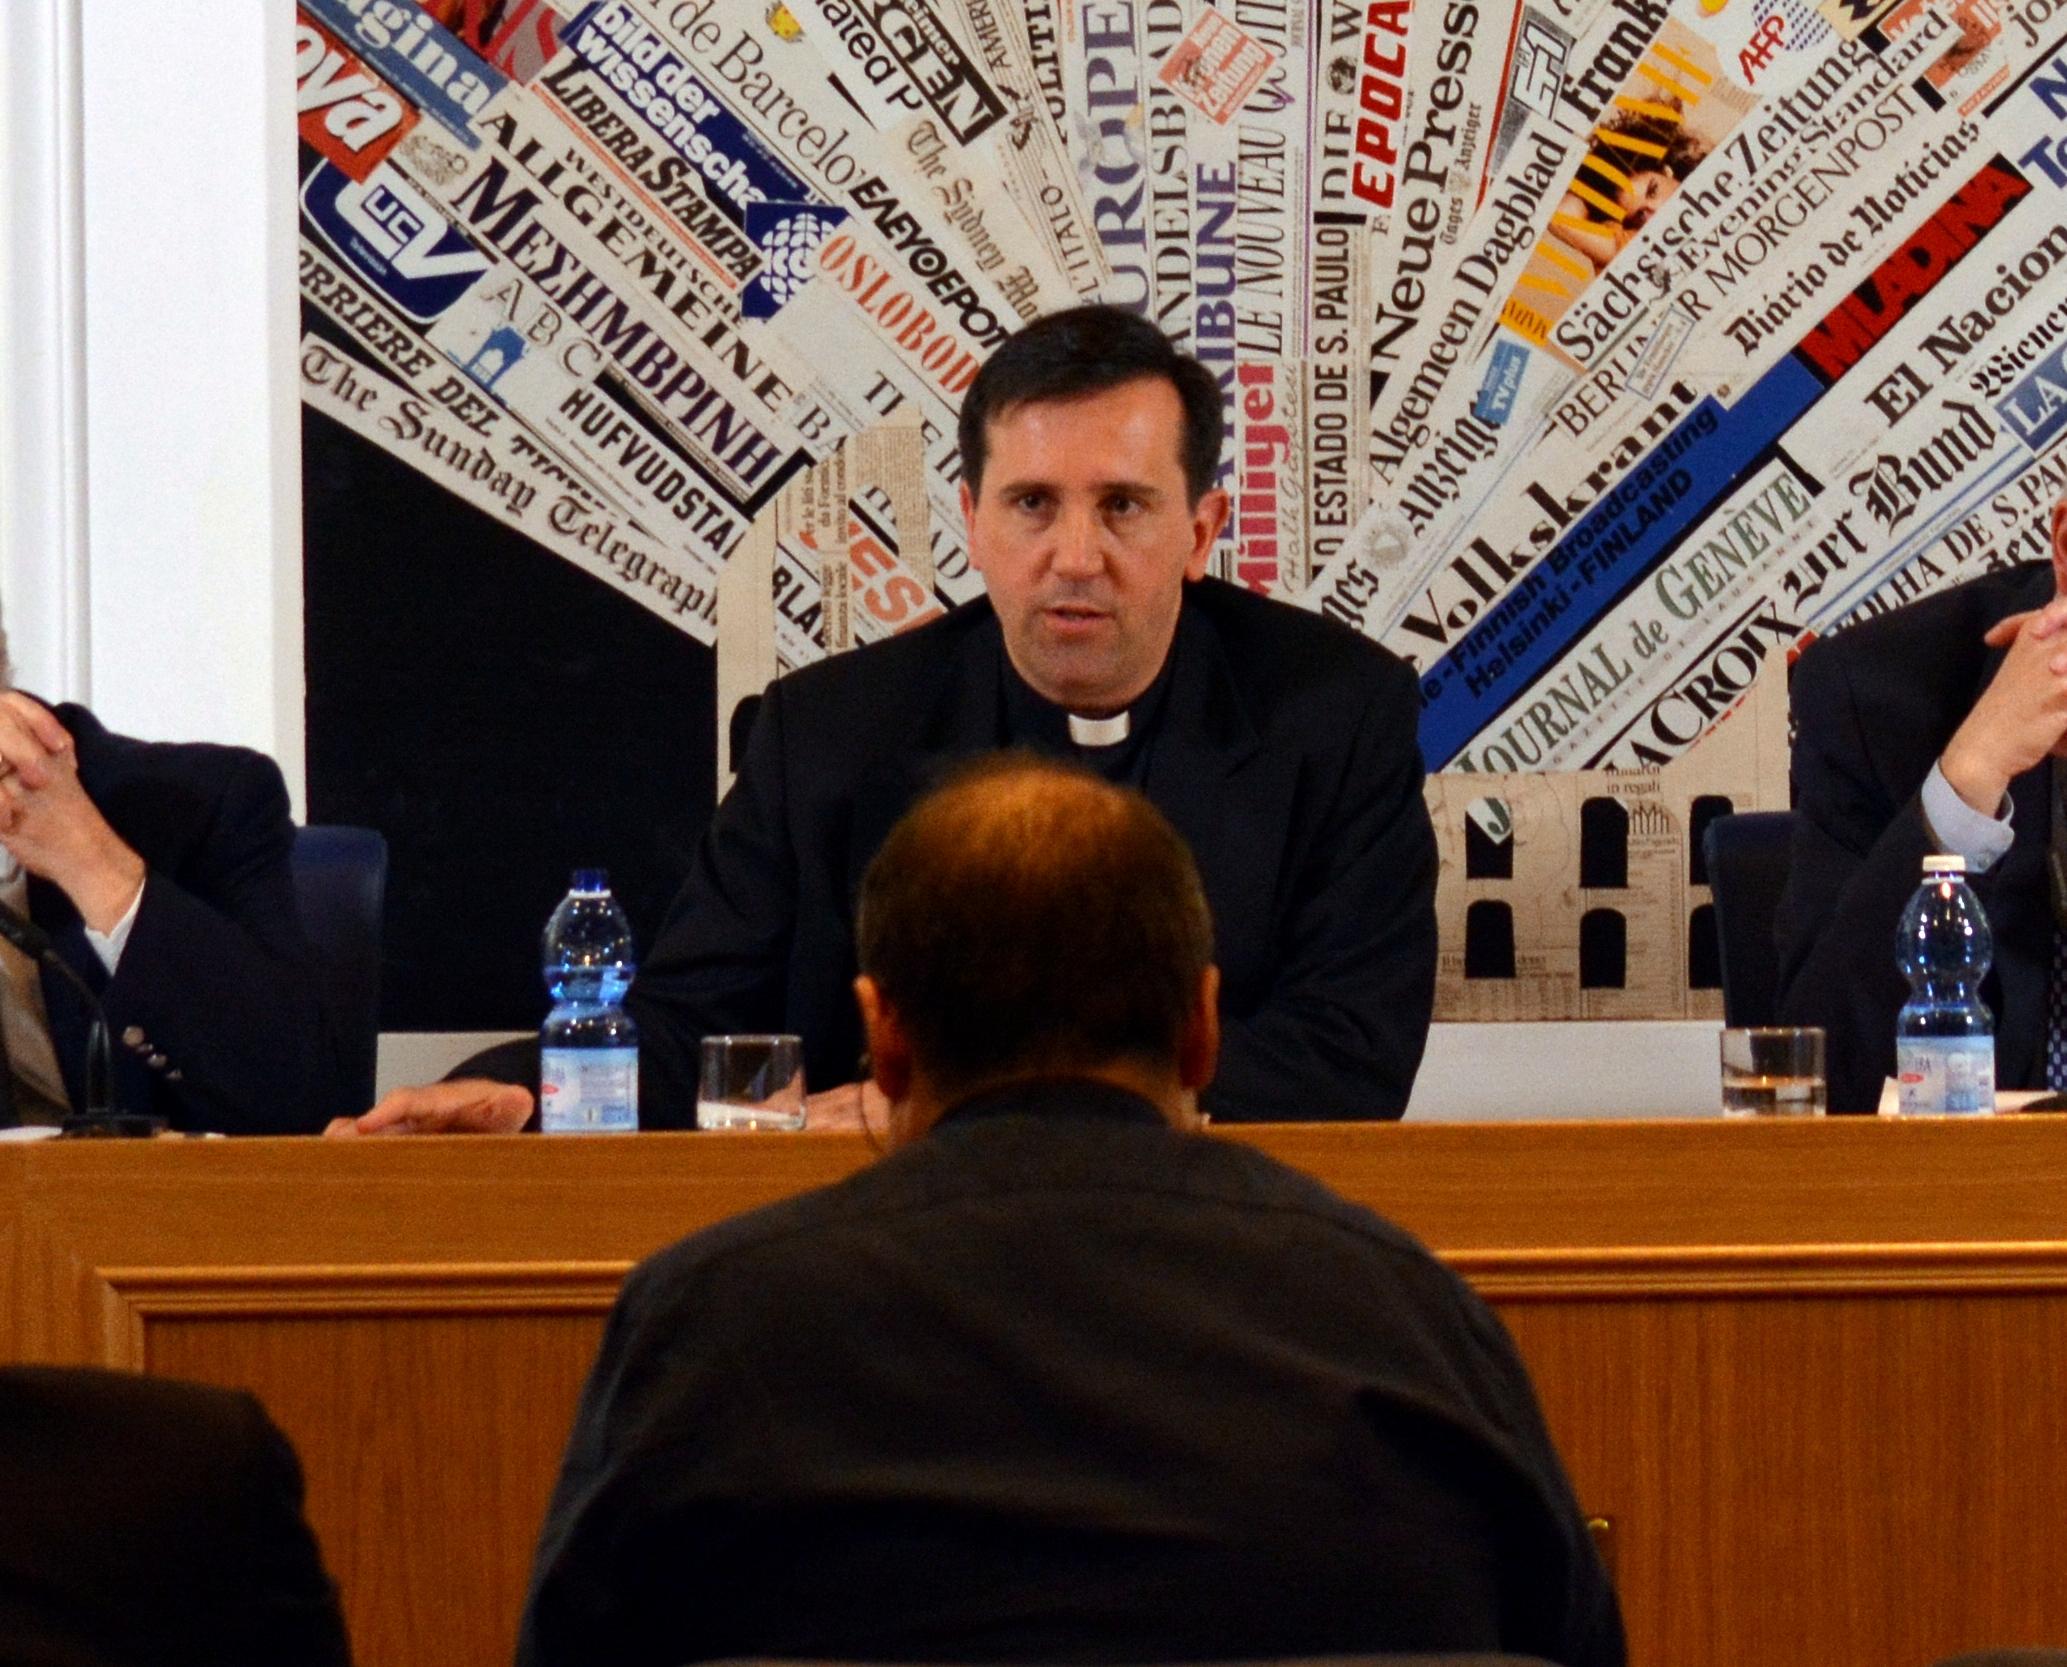 Un'intervista di RADIO ONDA UER a Padre Luca Gallizia, L.C.